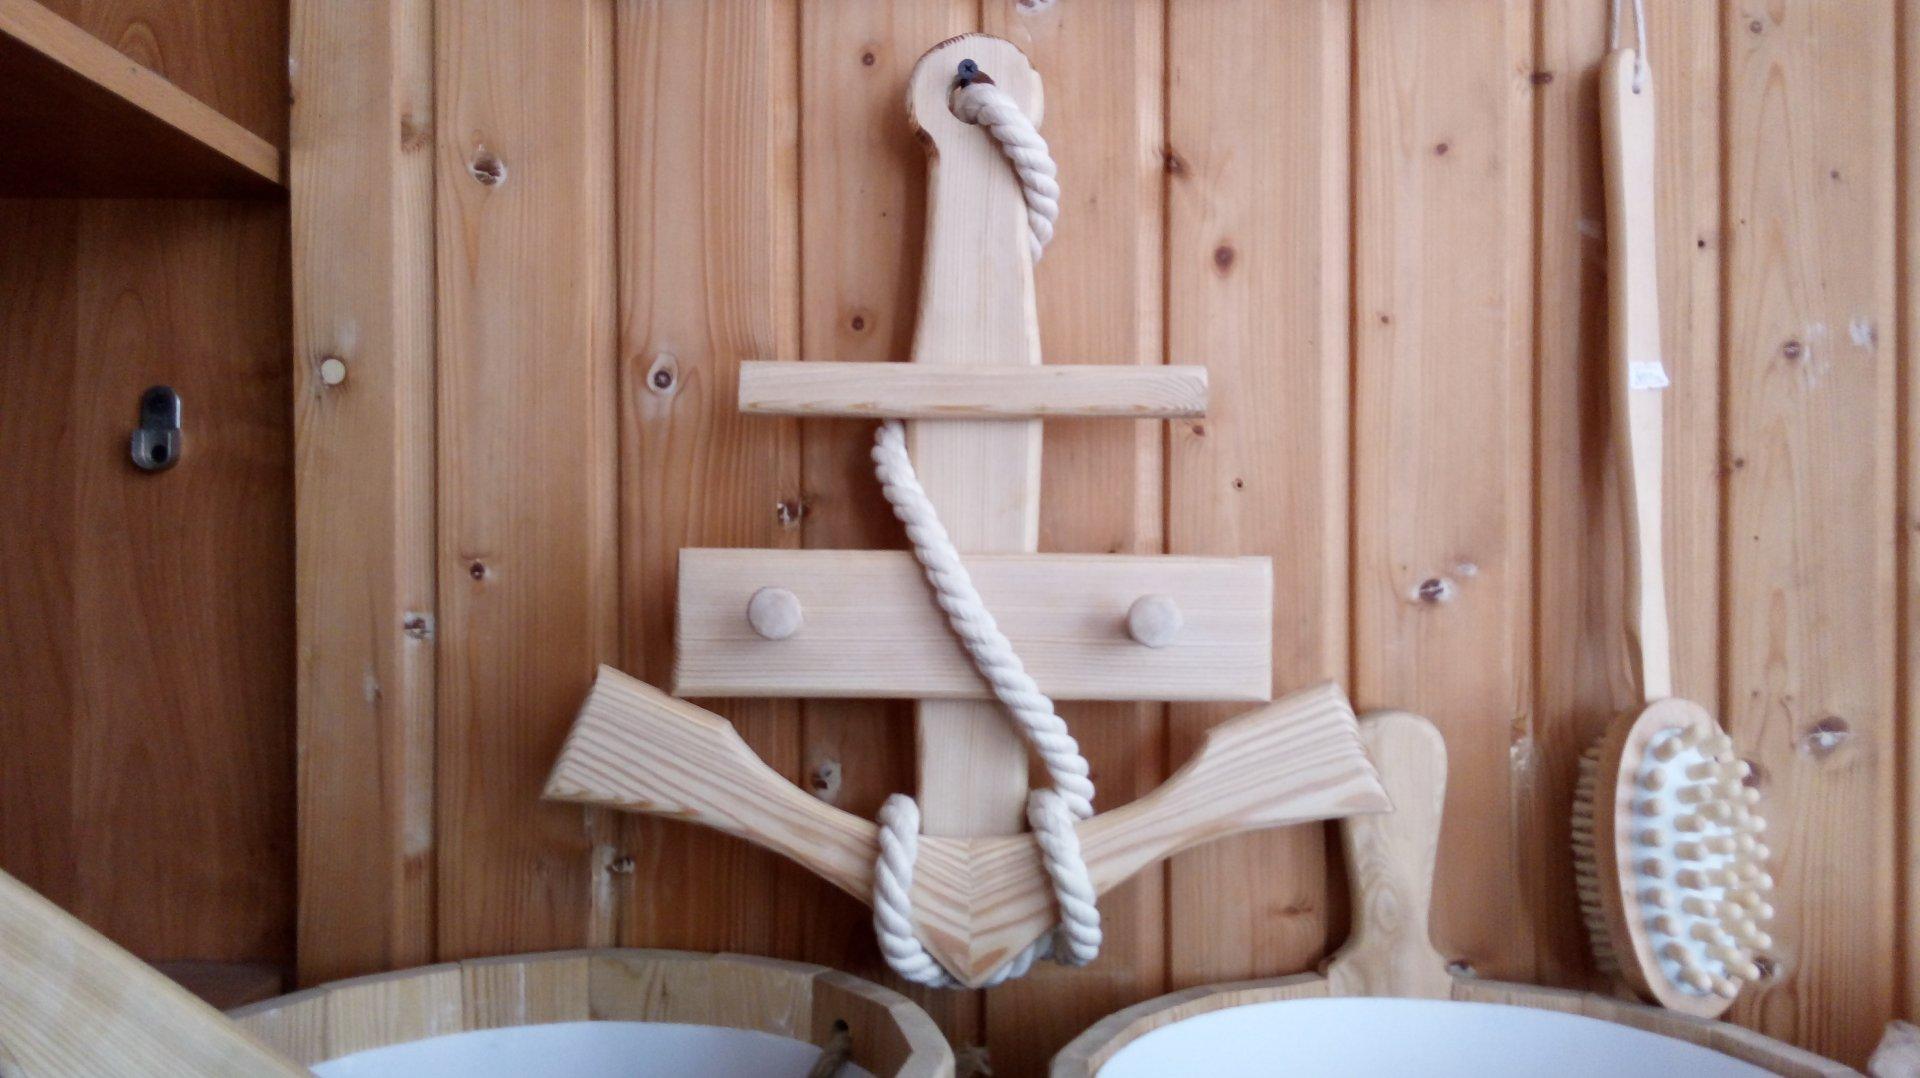 Вешалка для бани в виде якоря